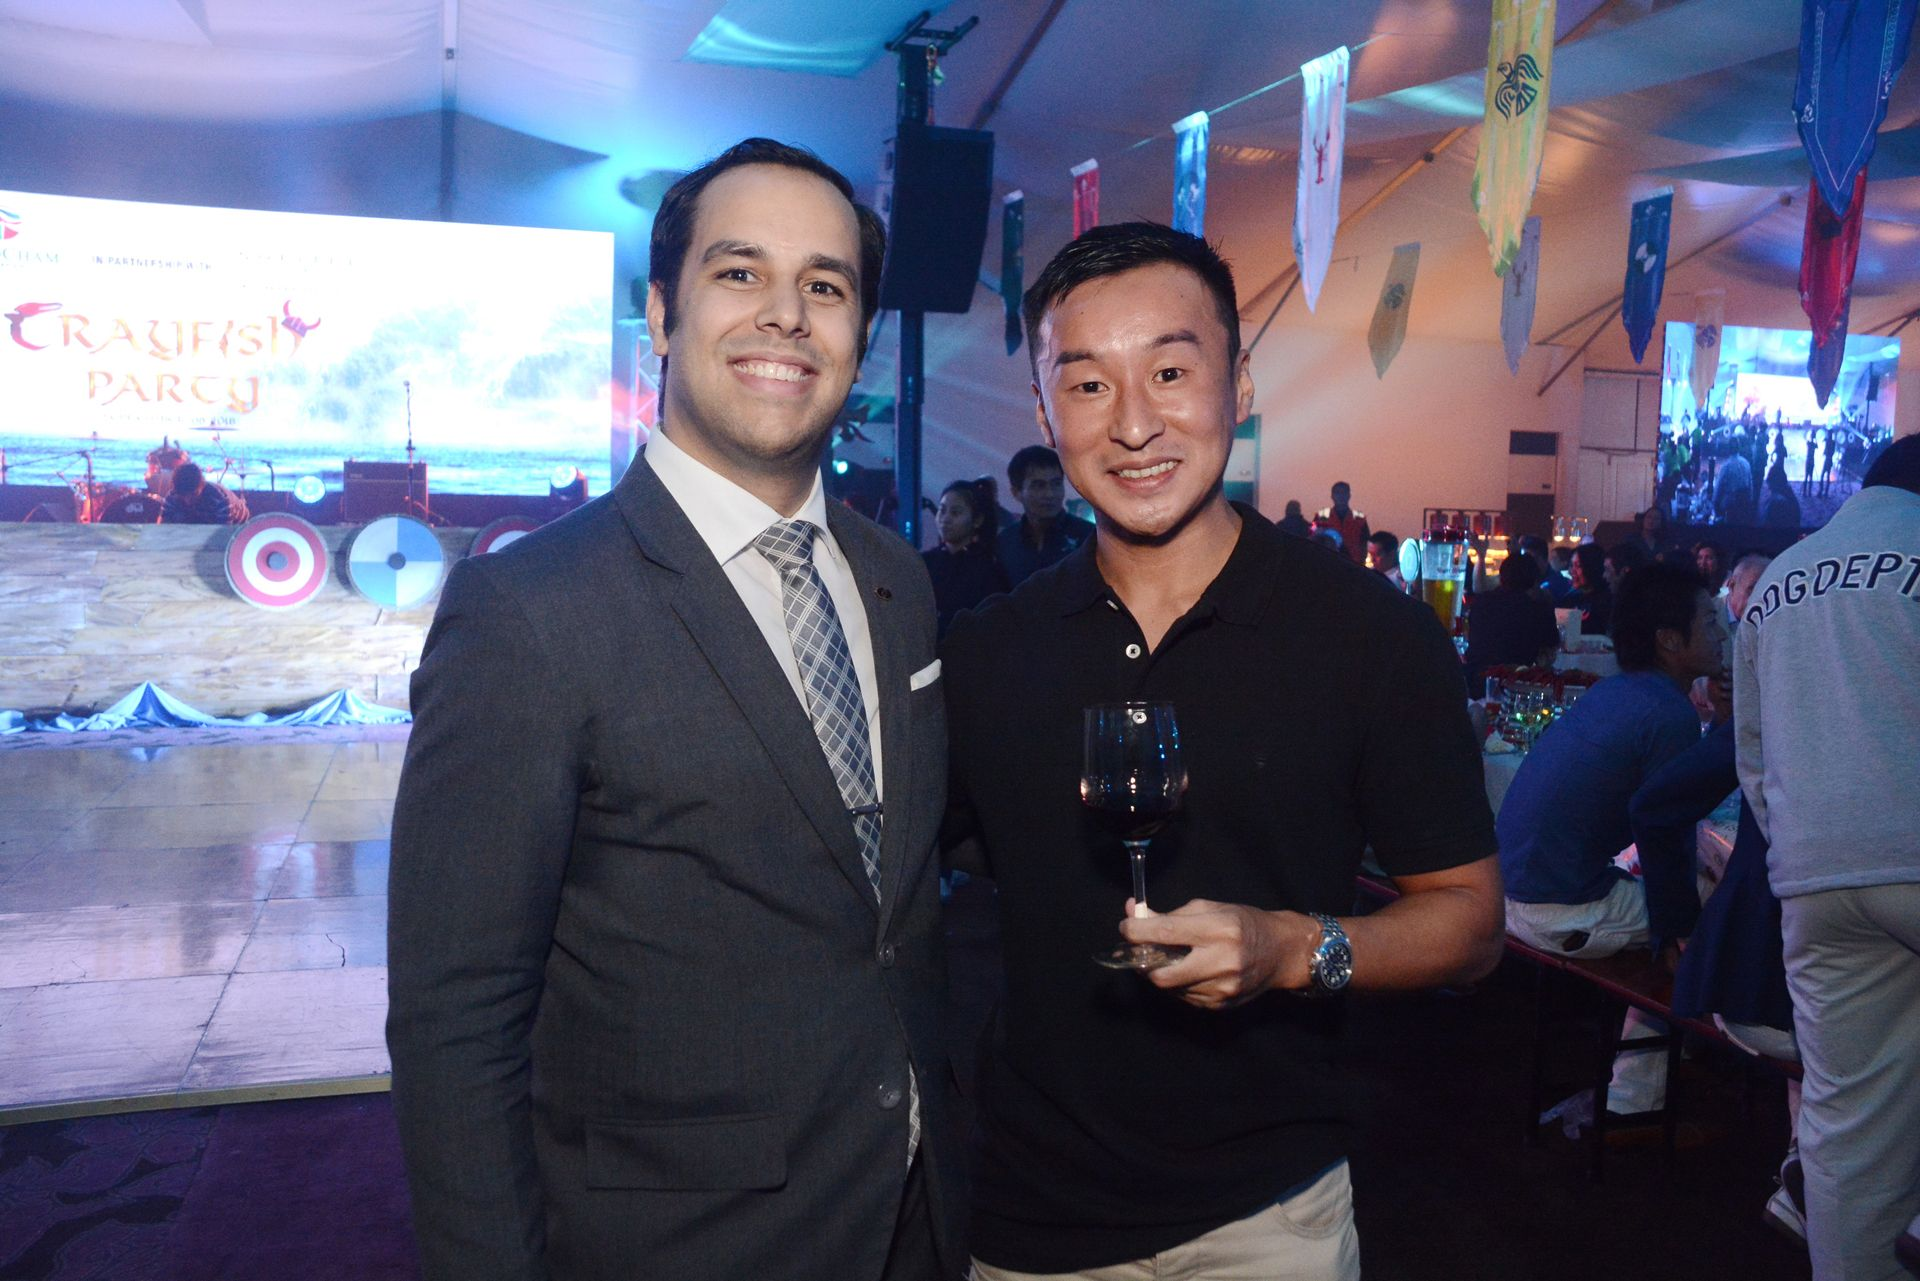 Sofitel Philippine Plaza's Food and Beverage Manager Tanguy Gras and Philippine Plaza Holding's Shunsuke Nakata